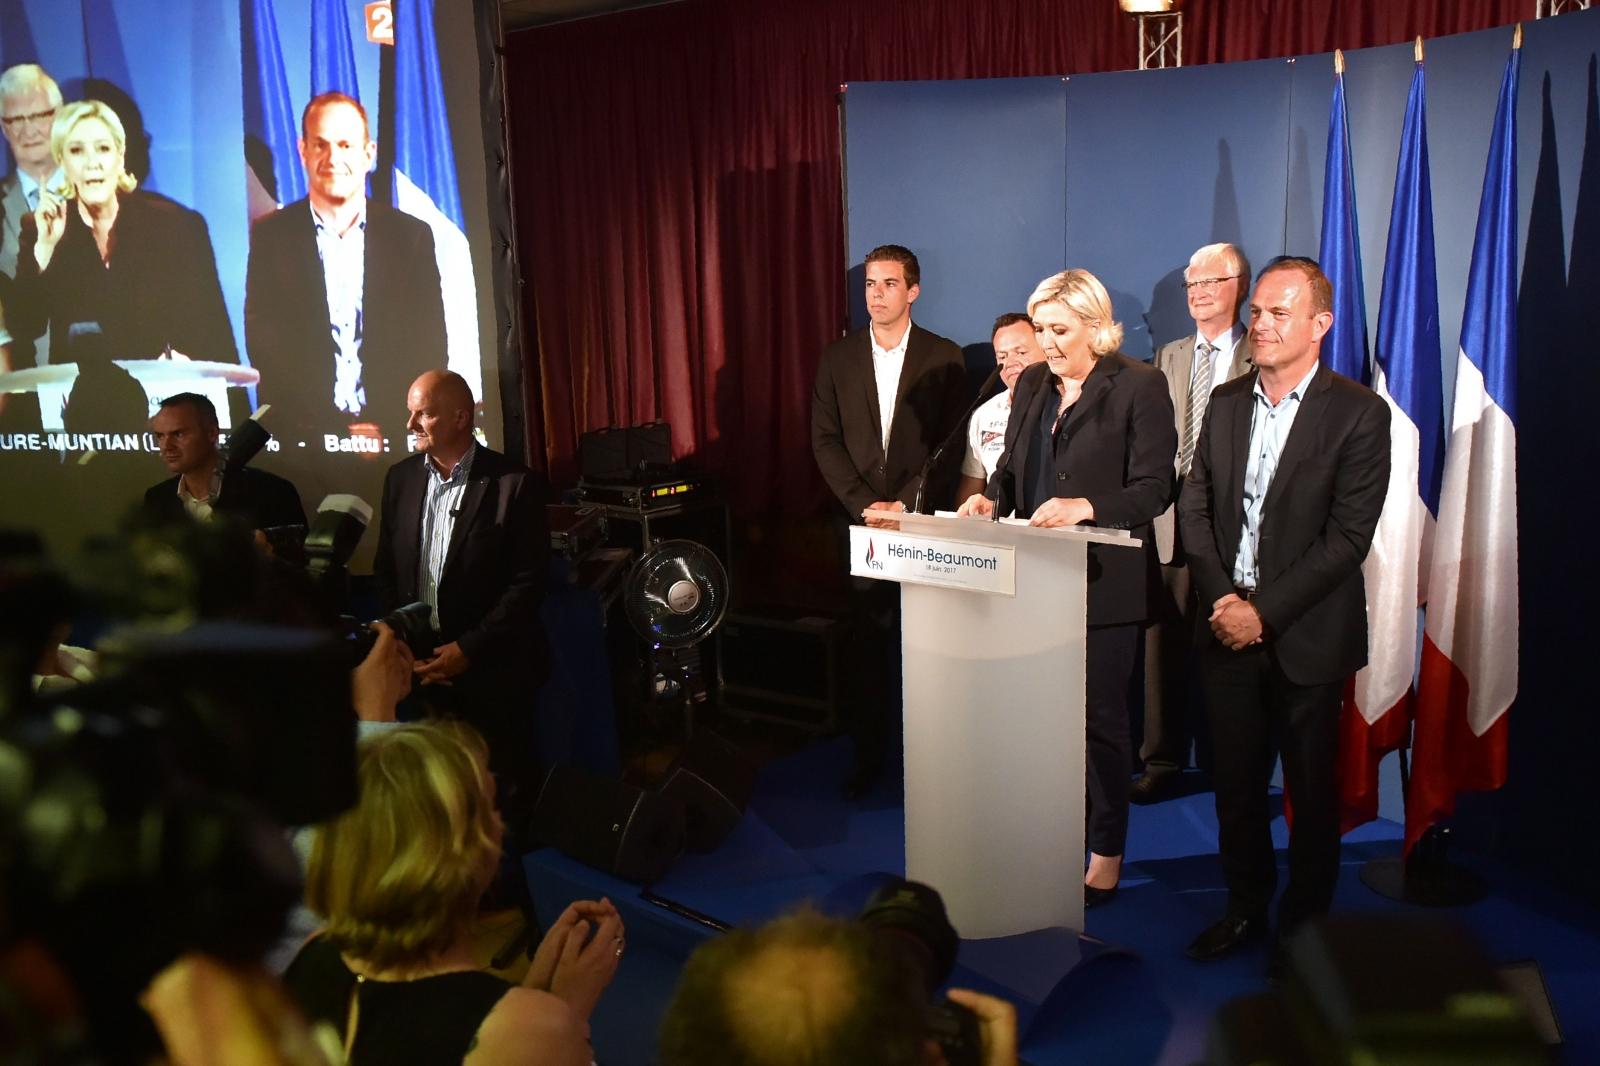 Marine Le Pen wins parliamentary seat